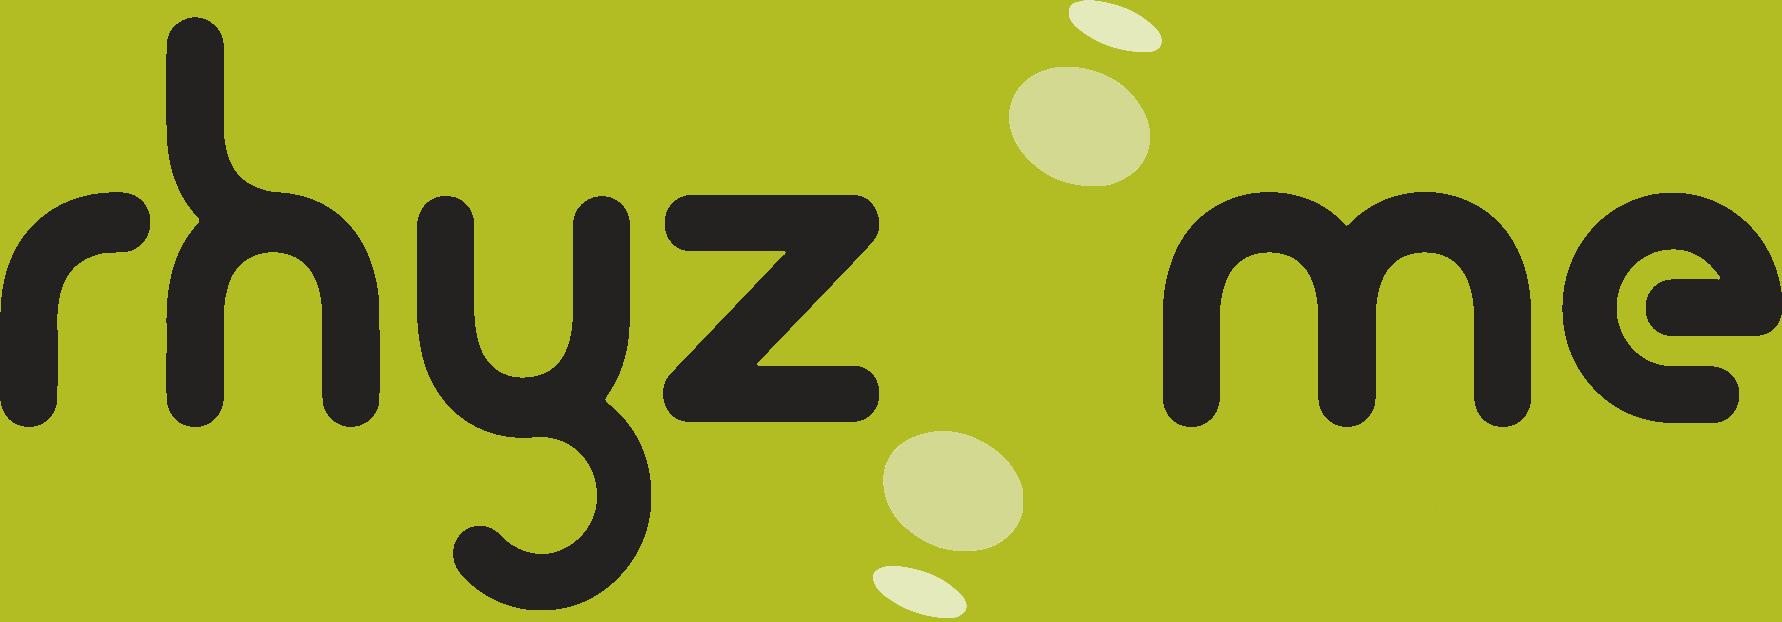 rhyzome